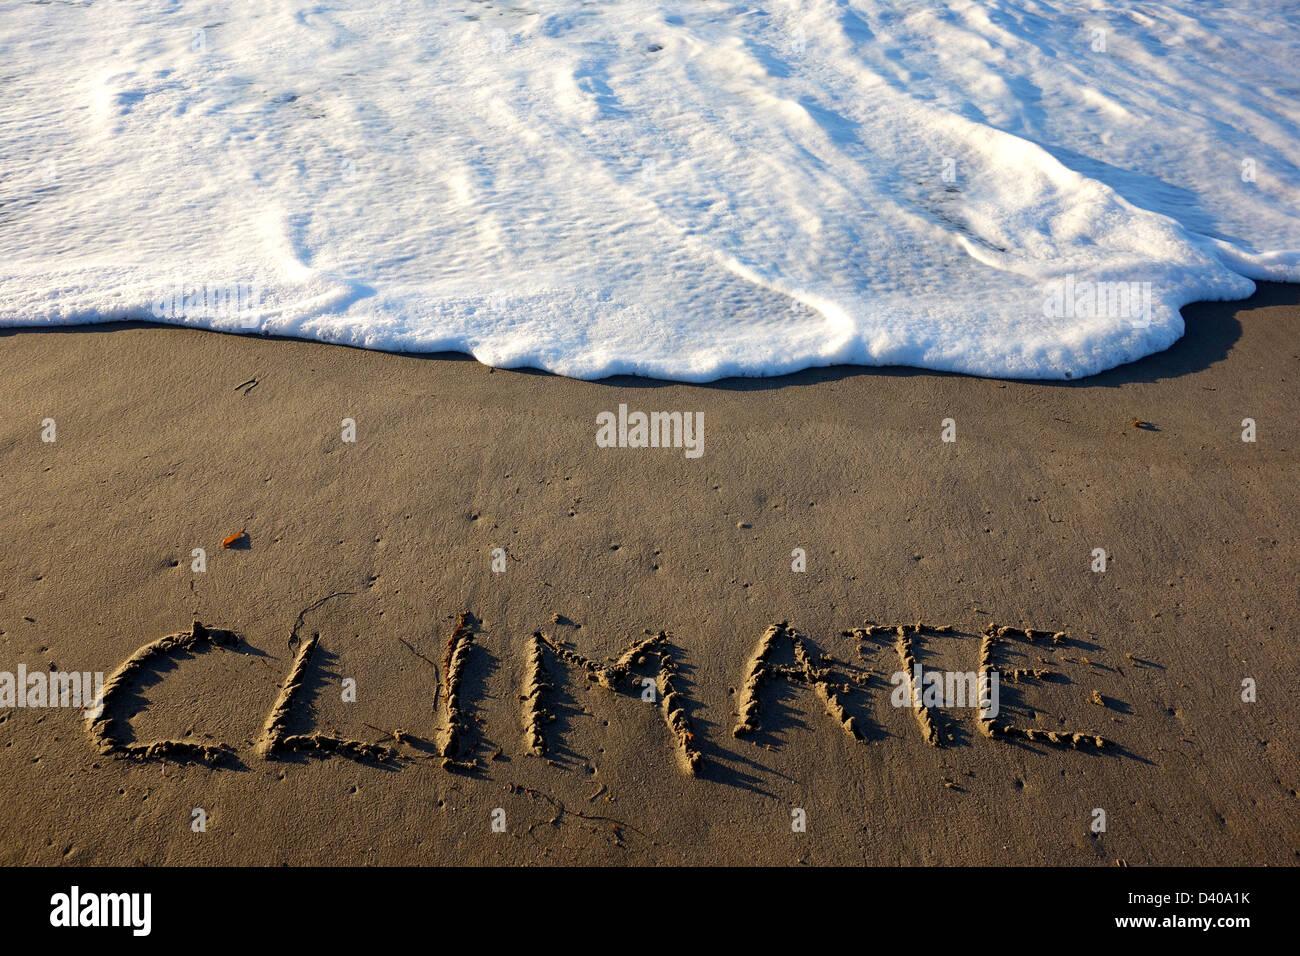 climate-change-oceans-rising-D40A1K.jpg